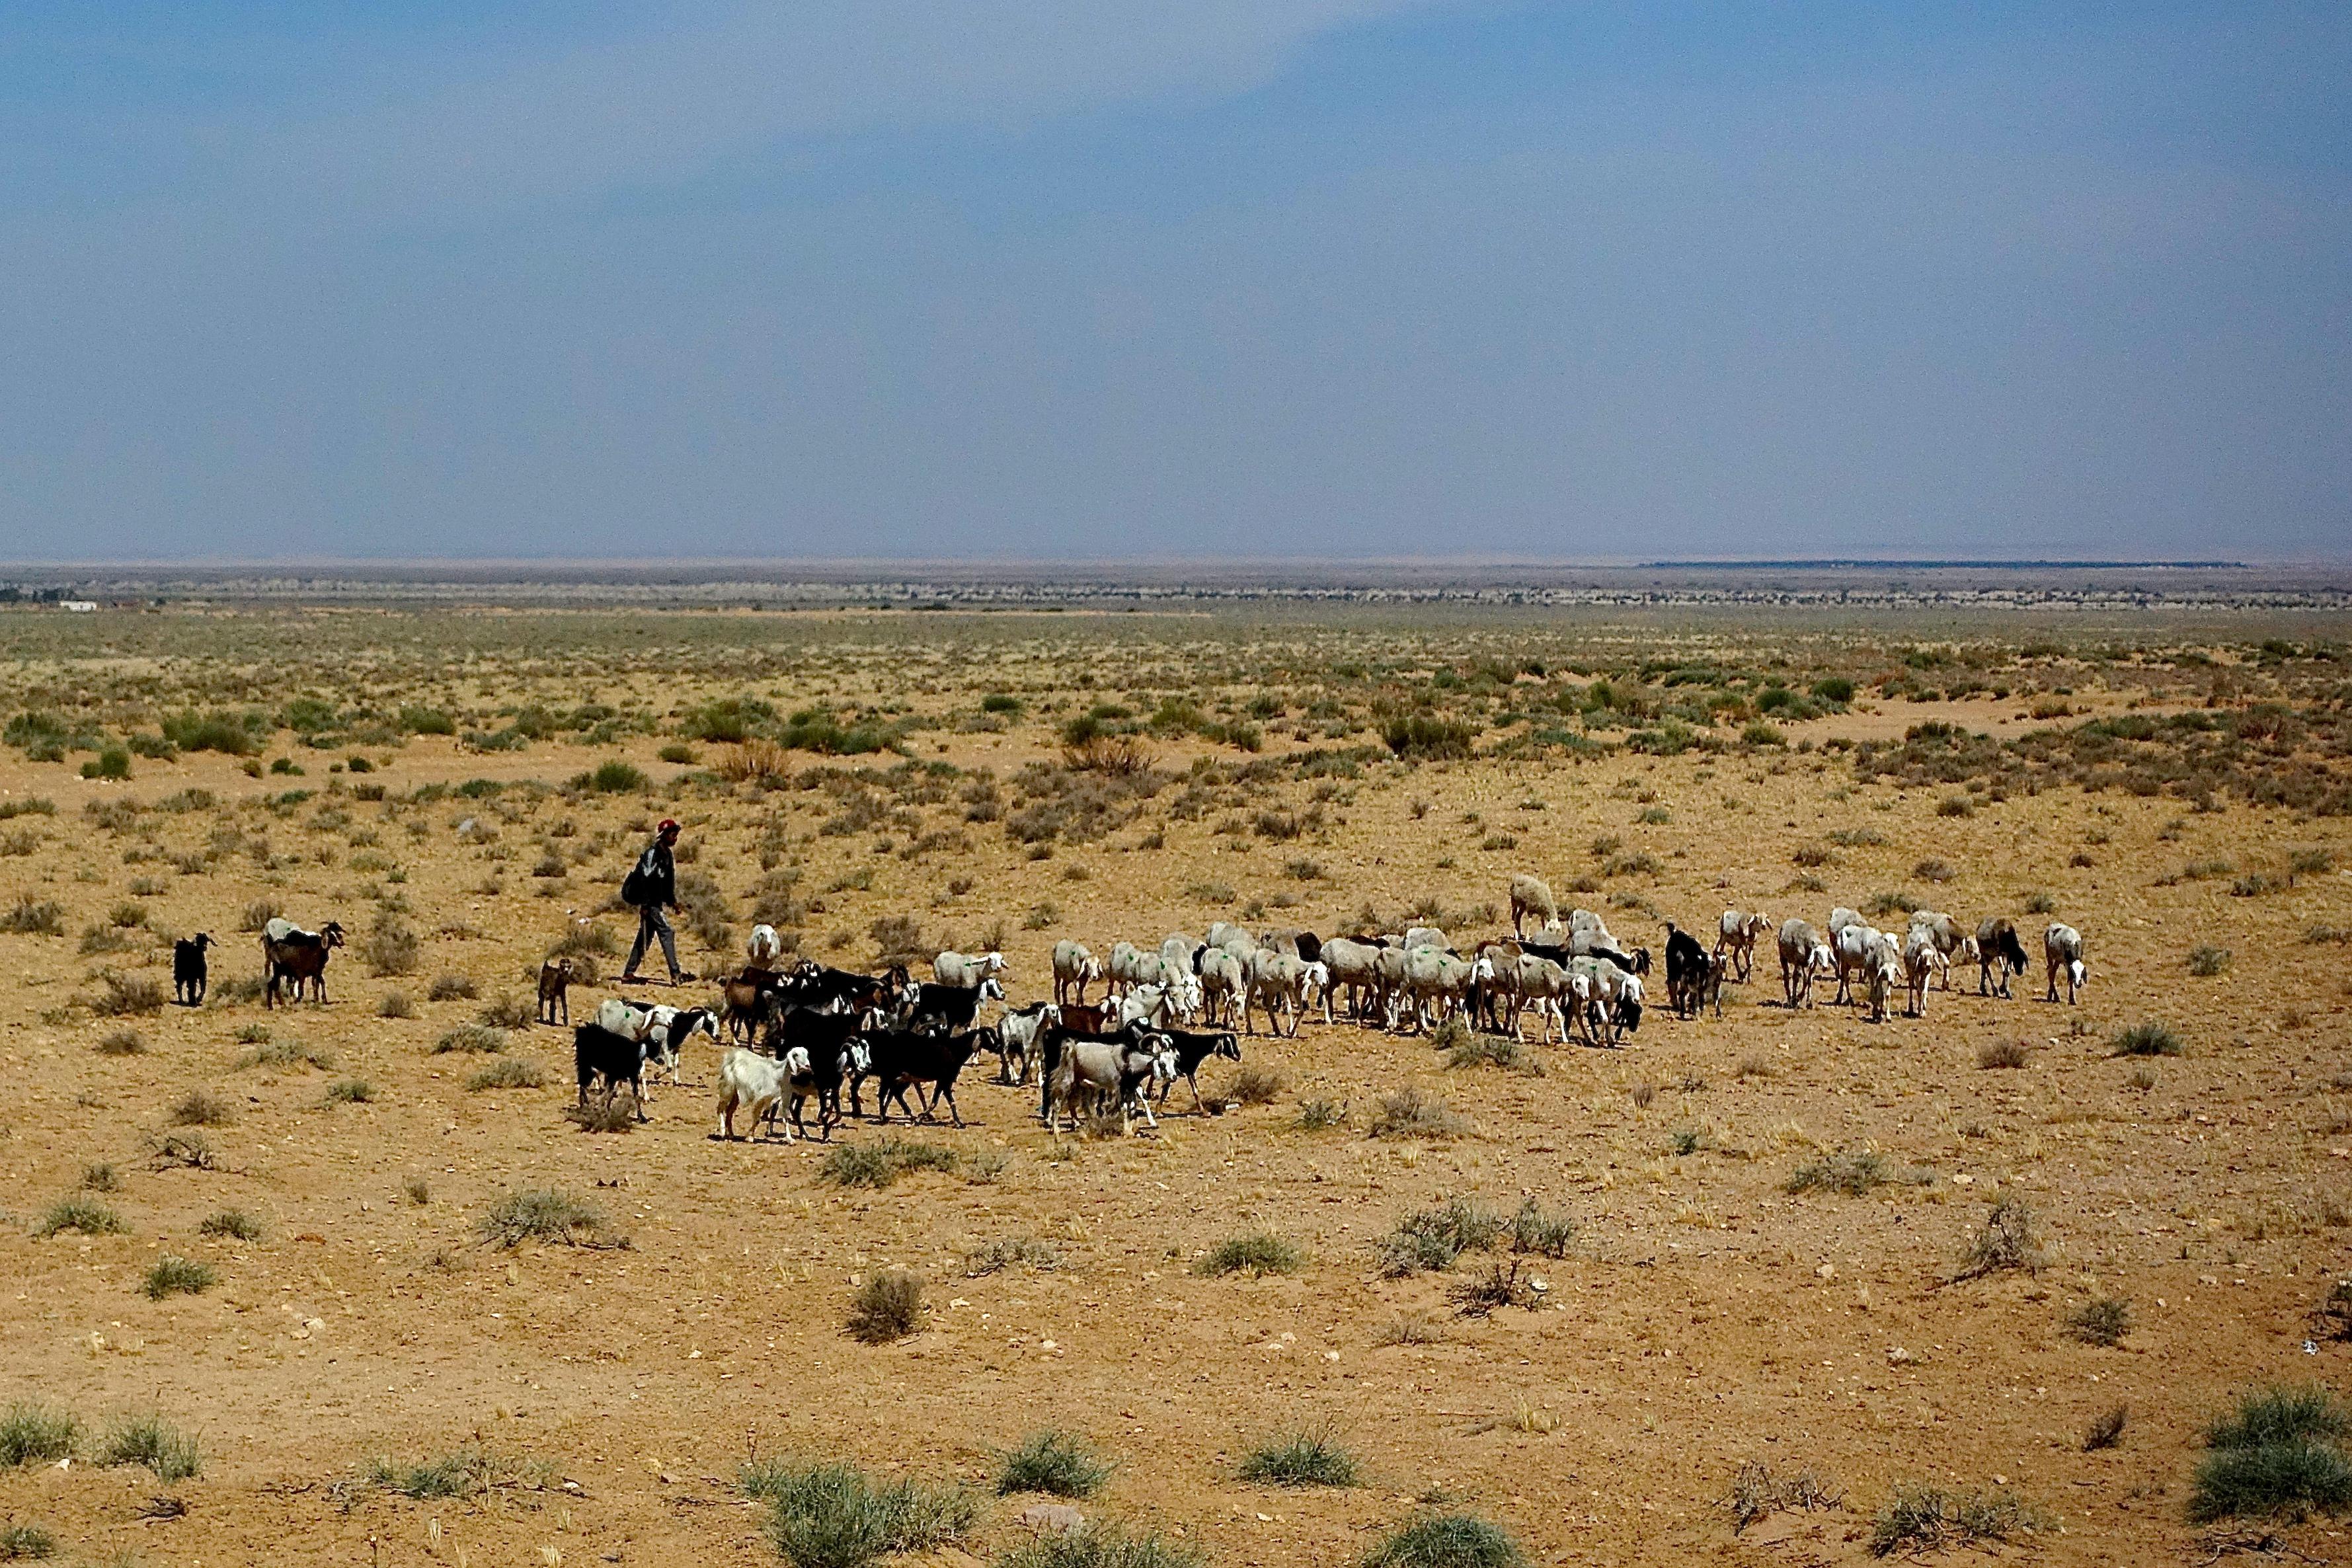 Goat herder. Tunisia